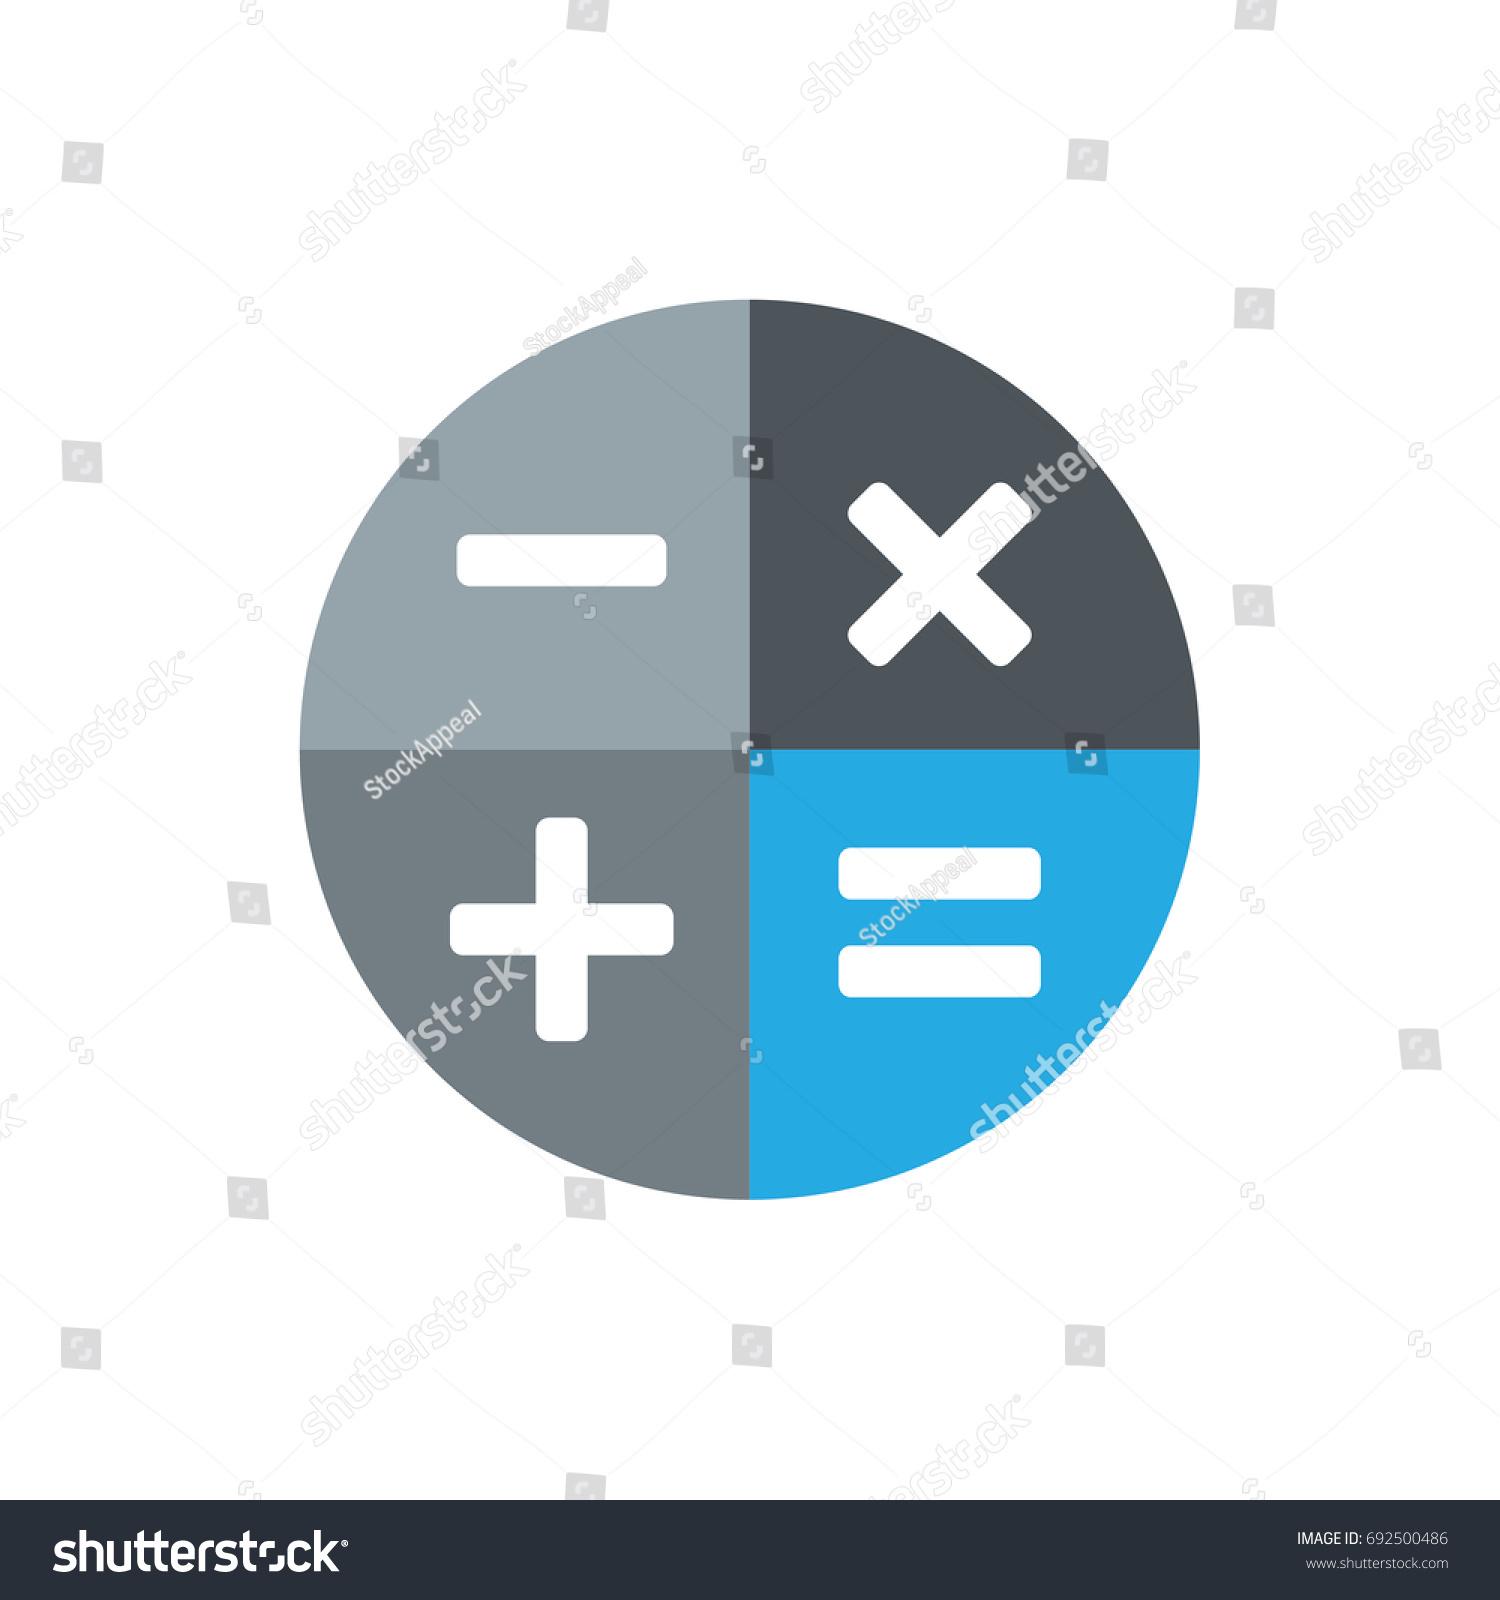 Numbers, calculator, plus sign, minus sign, plus, minus, yellow.